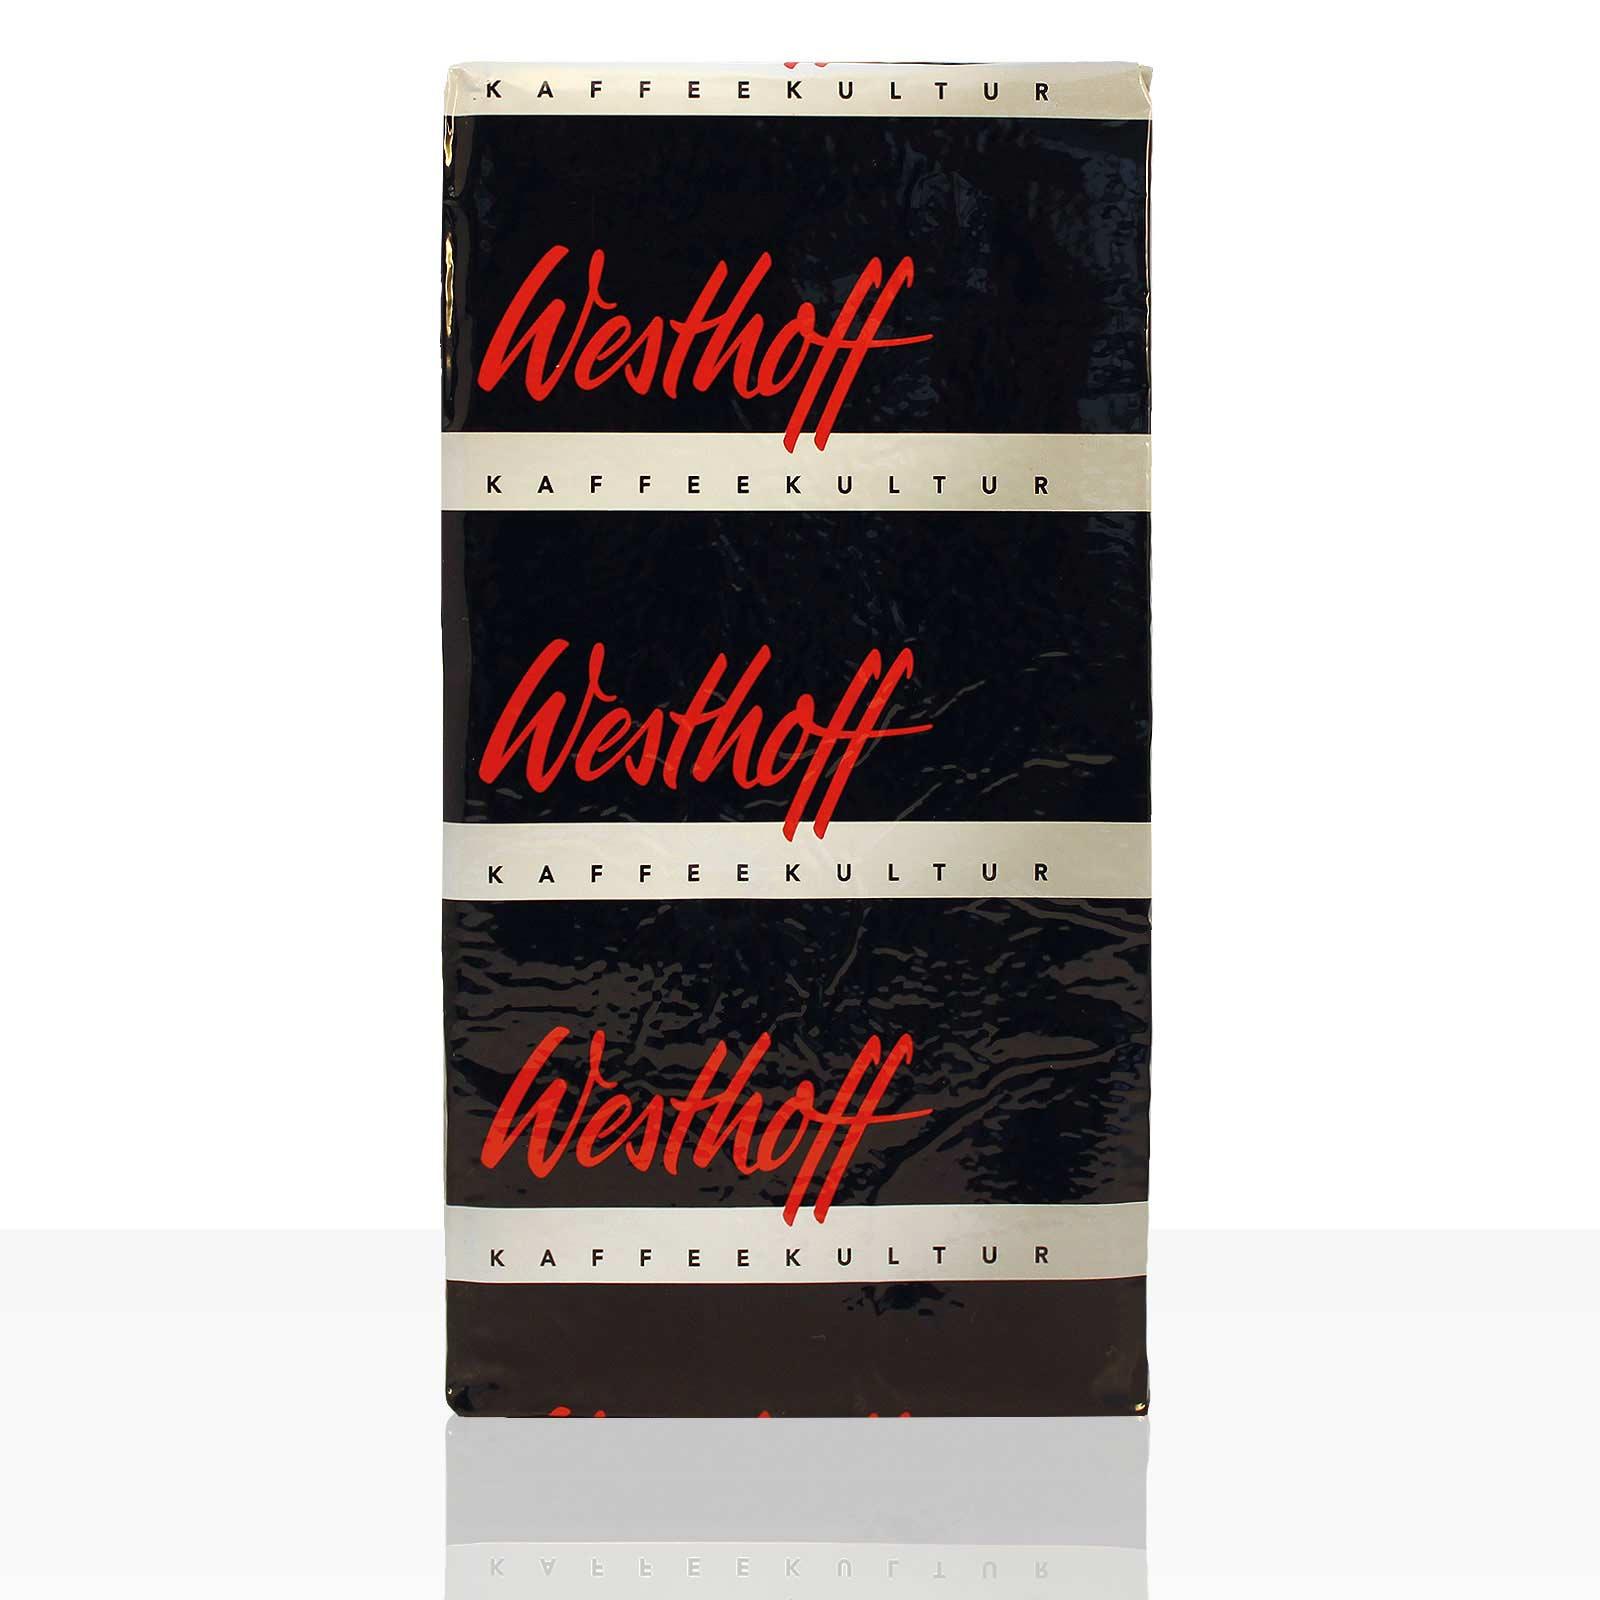 Westhoff Derby - 500g Kaffee gemahlen, Filterkaffee